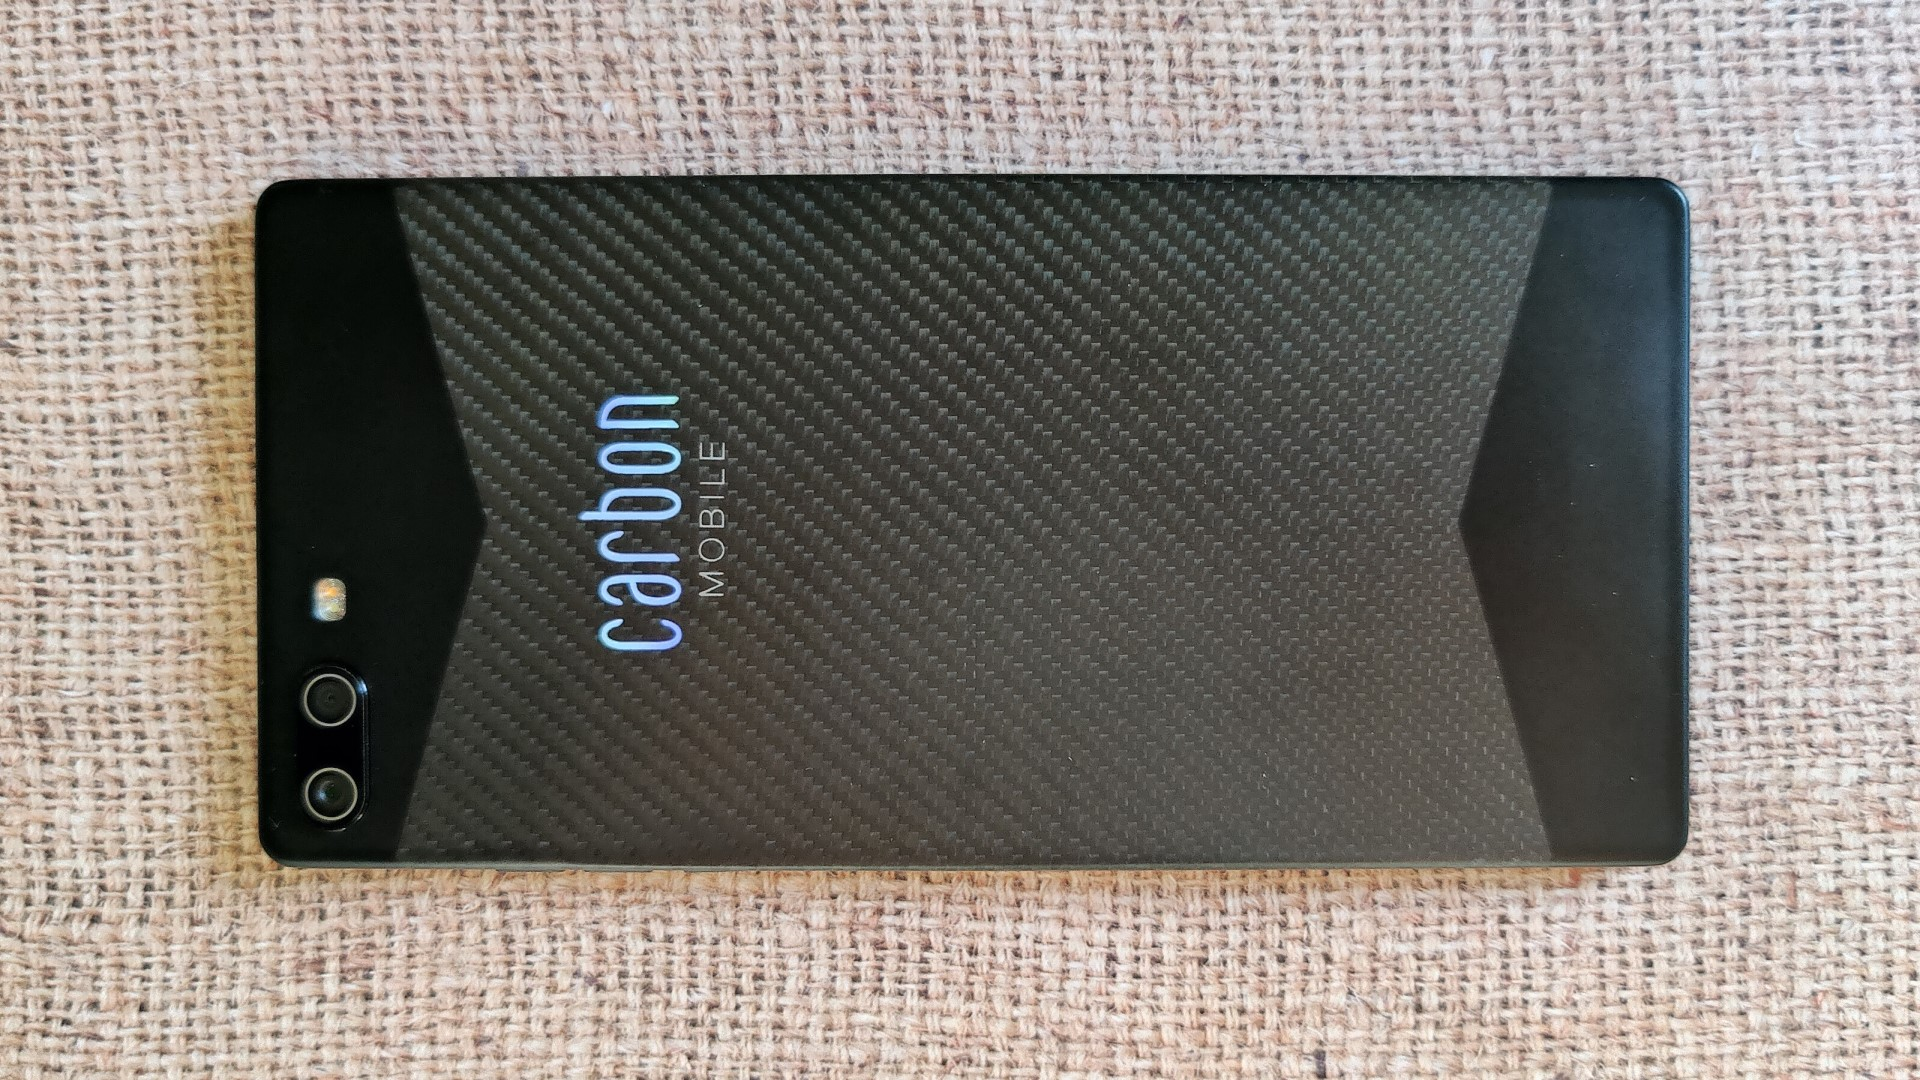 Carbon smartphone